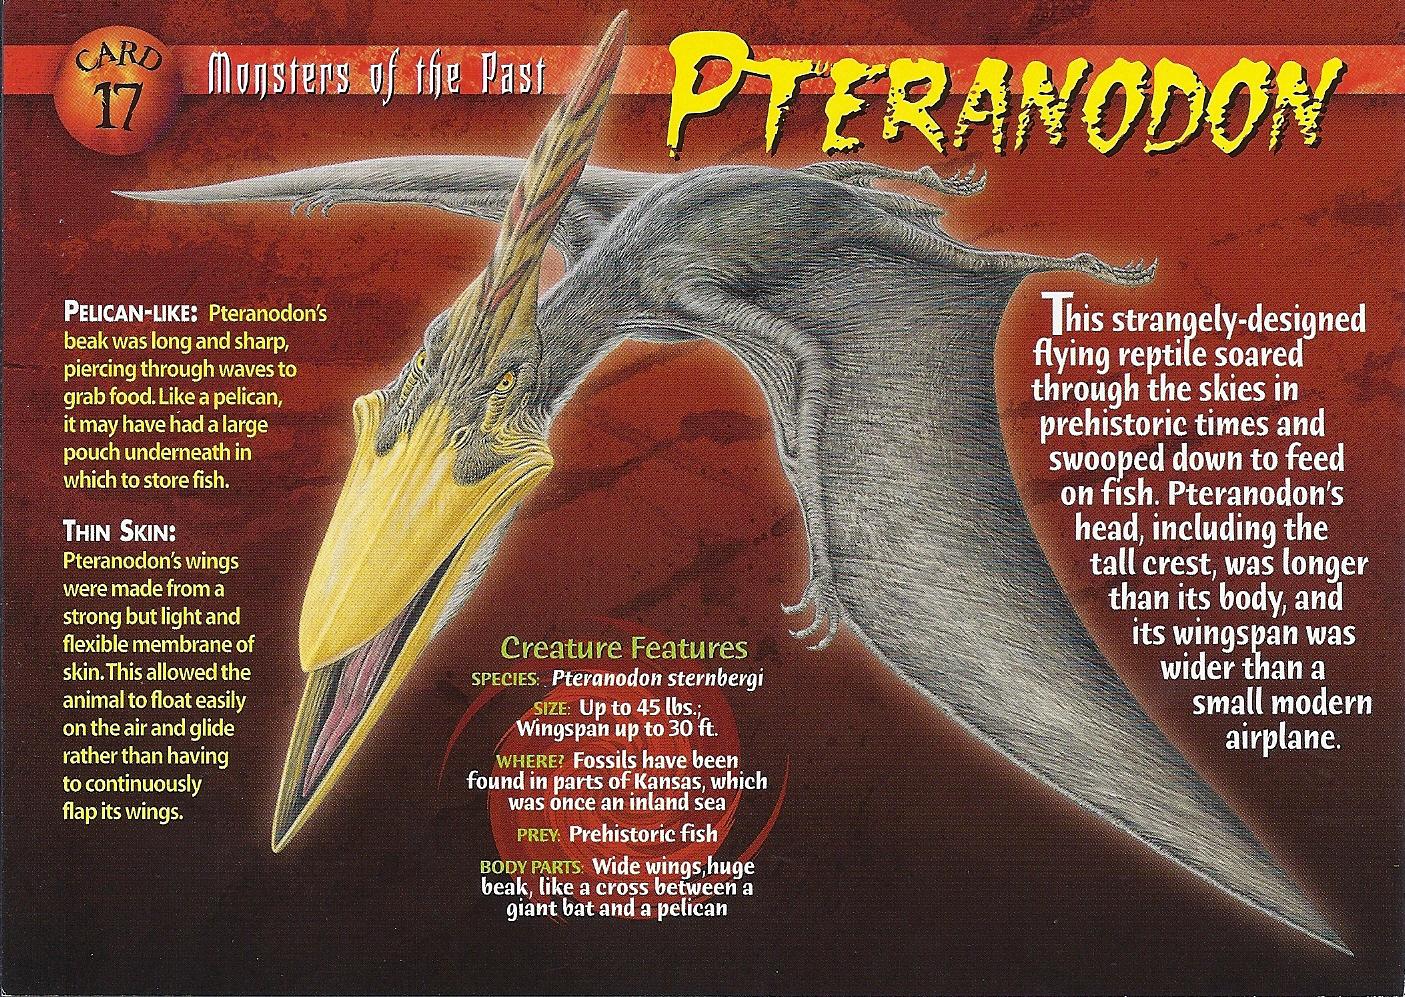 pteranodon wierd nwild creatures wiki fandom powered